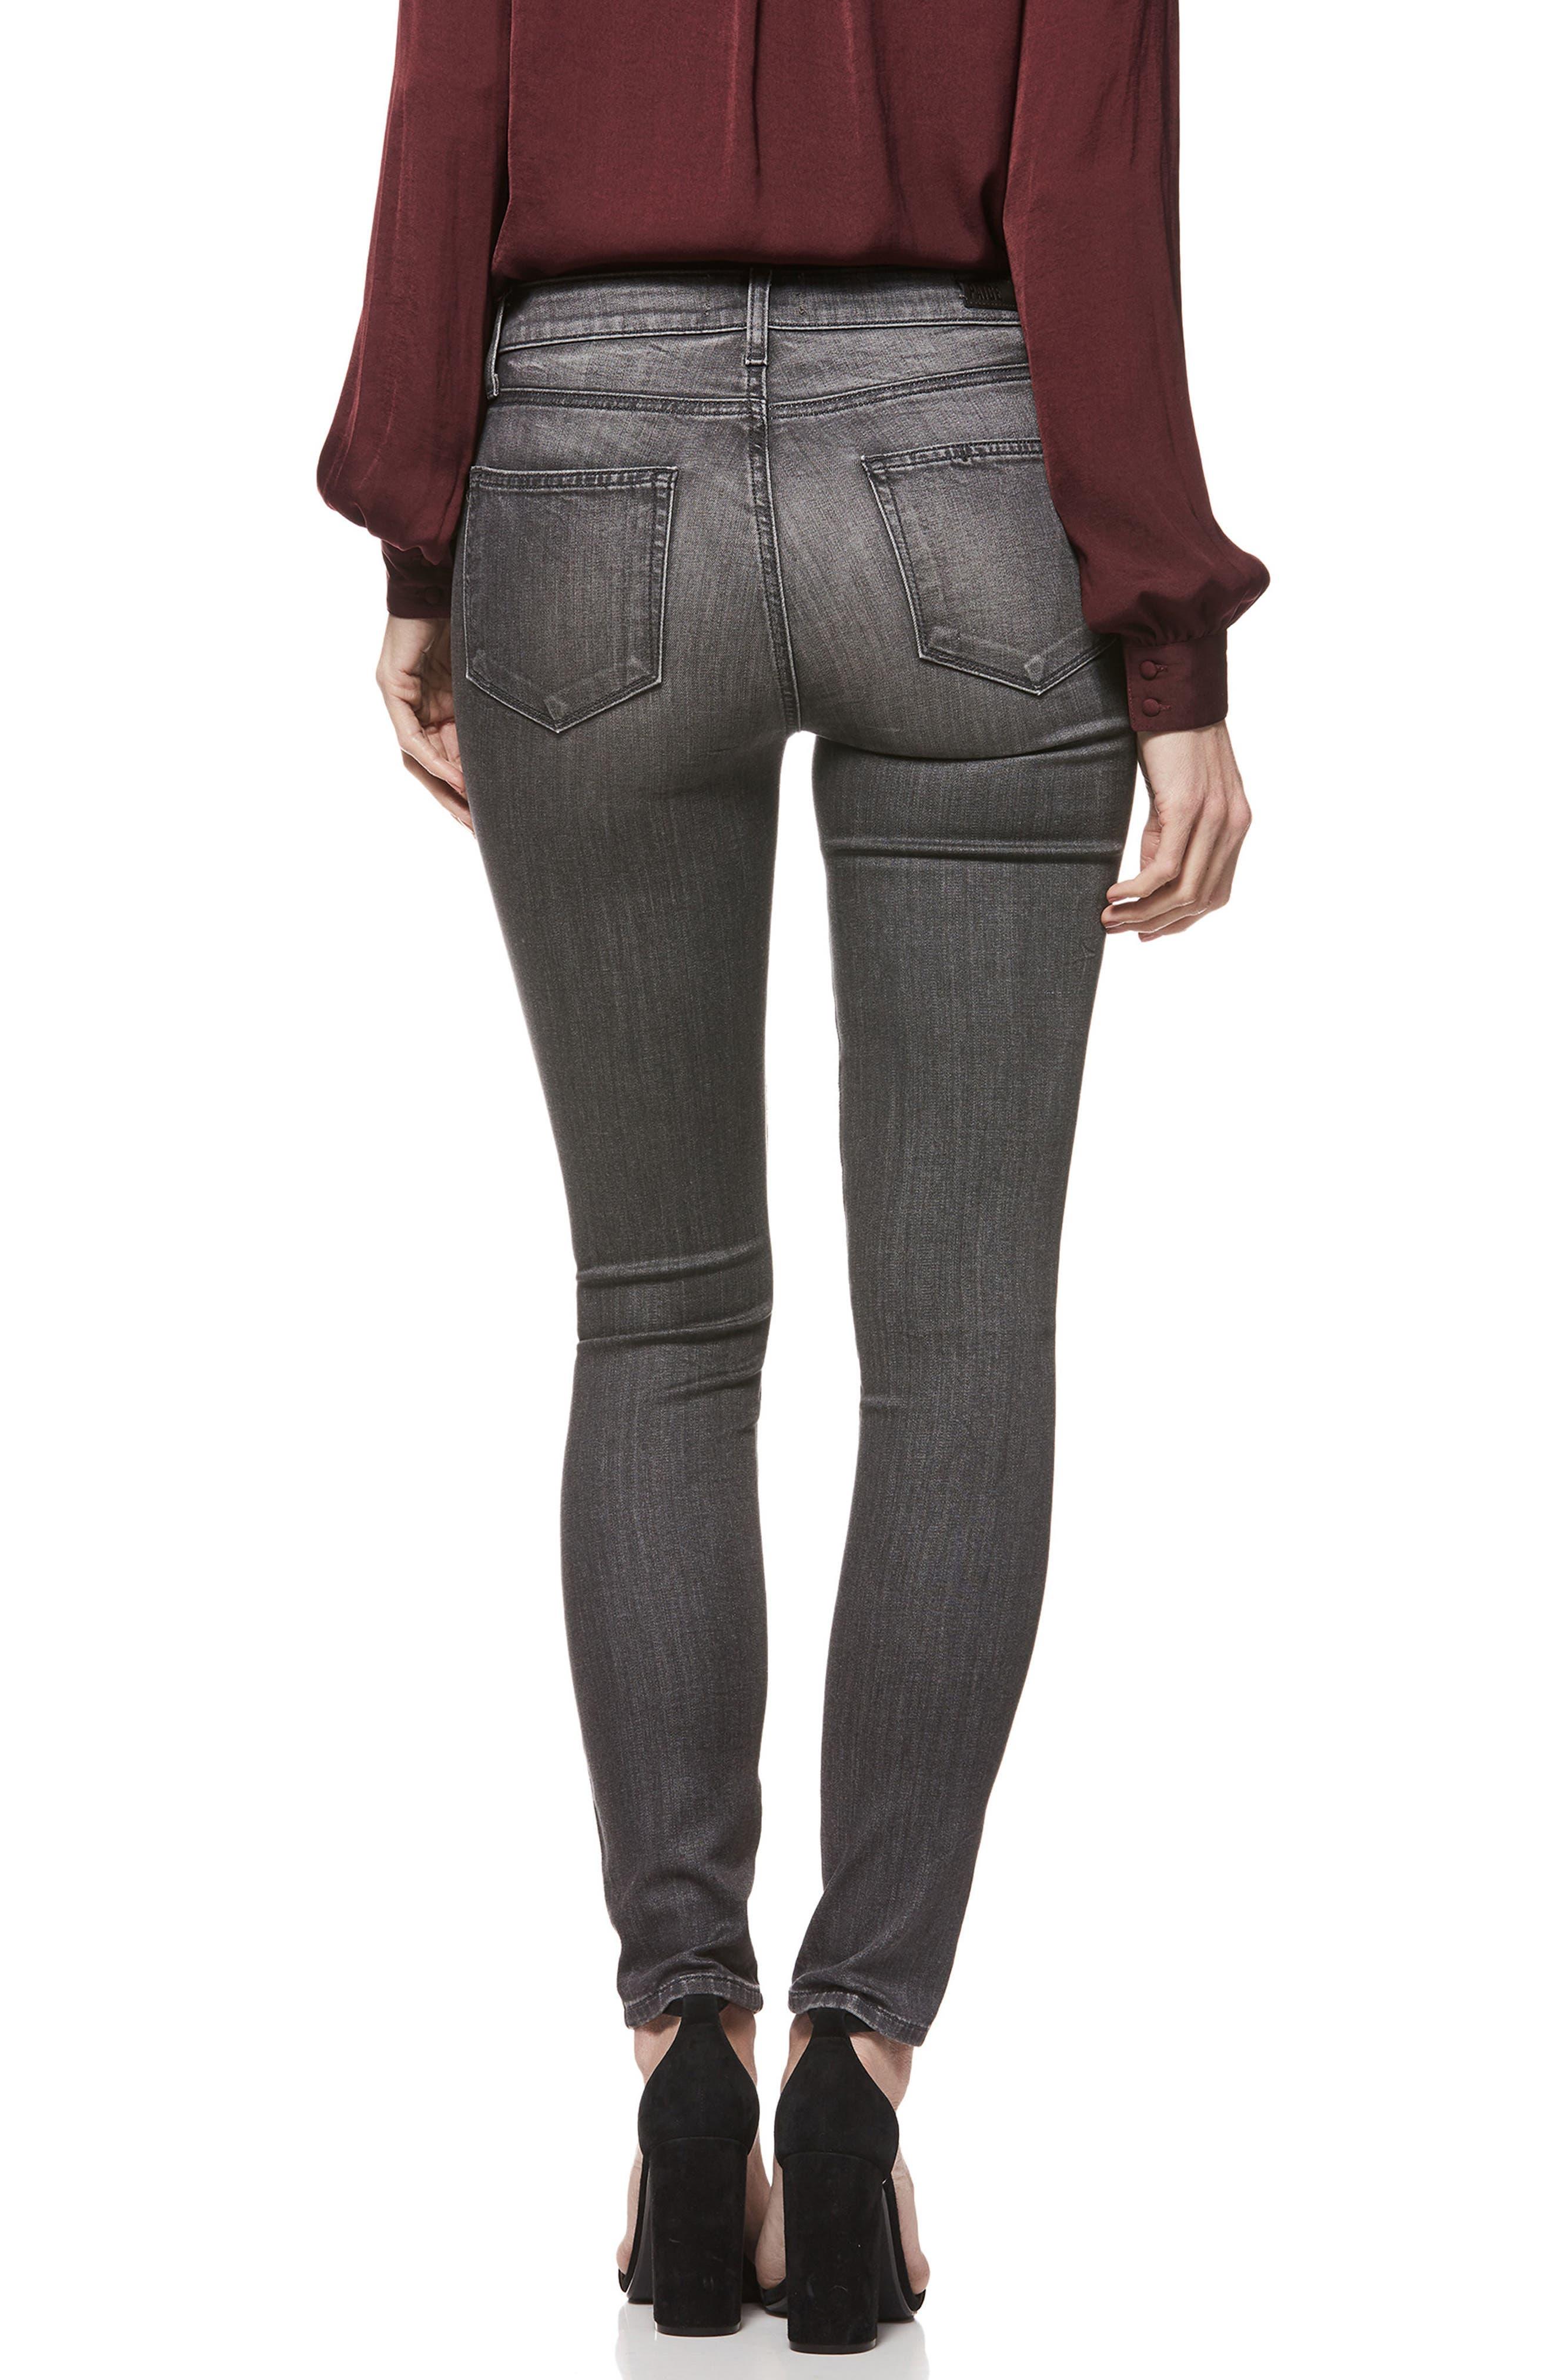 Hoxton Transcend High Waist Skinny Jeans,                             Alternate thumbnail 2, color,                             GREY PEAKS